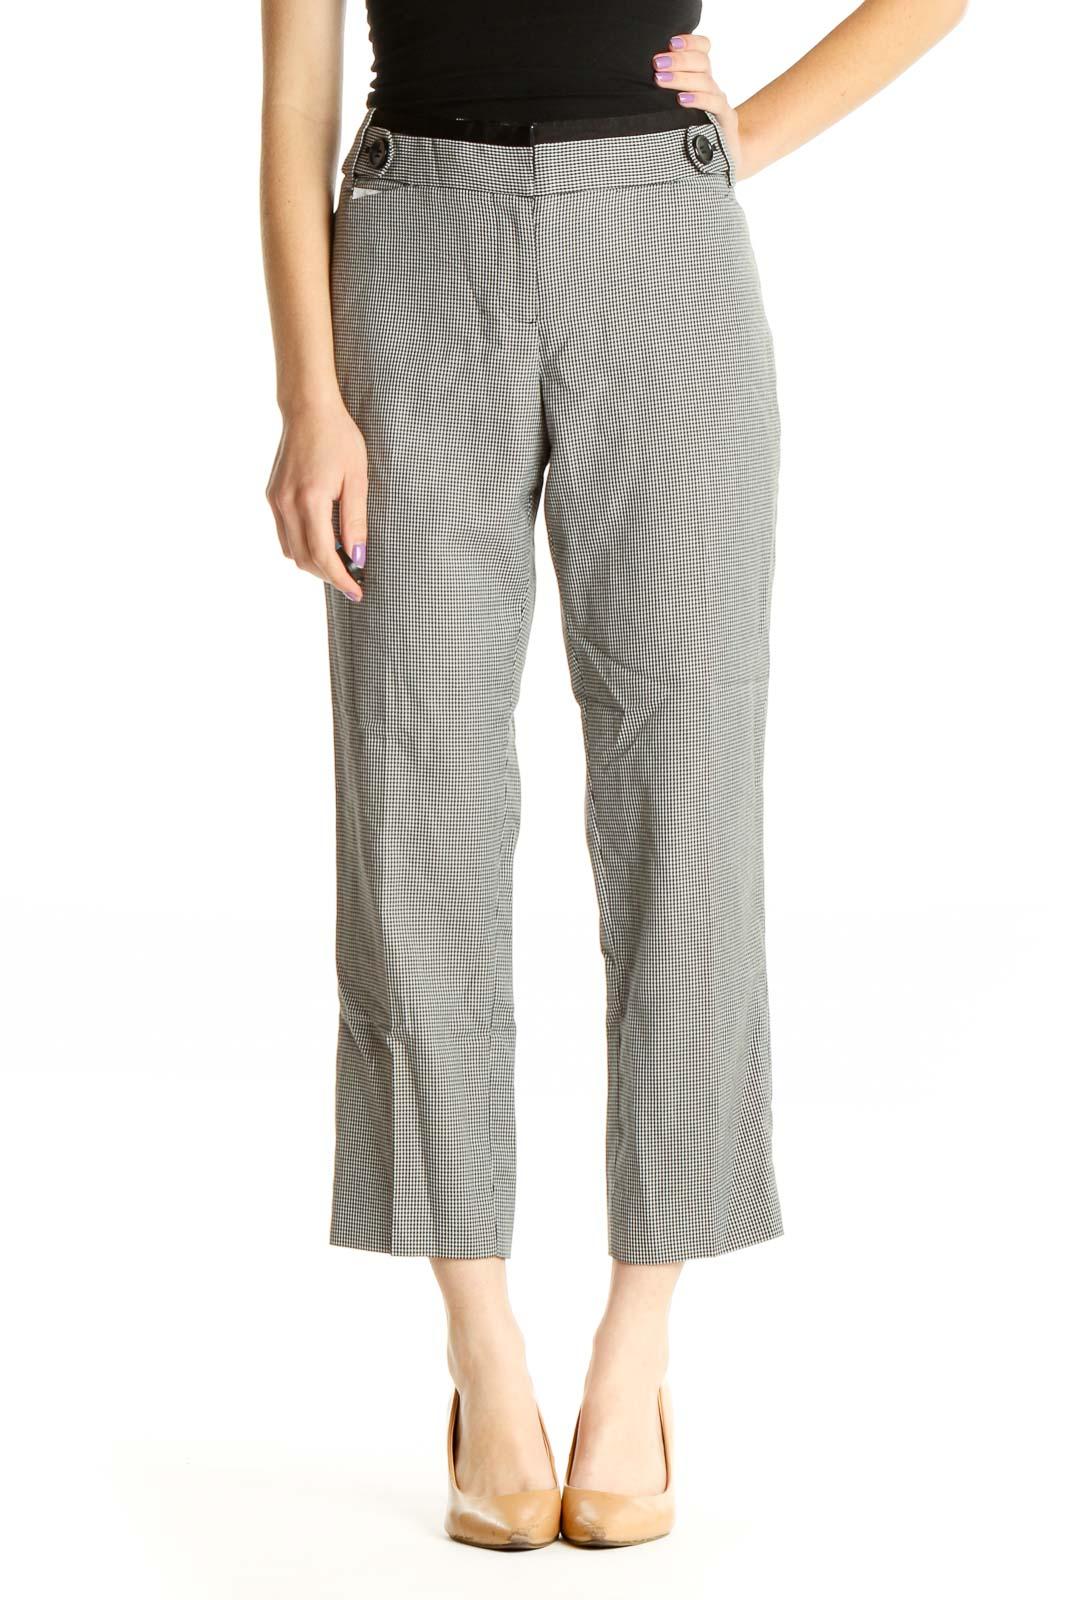 Gray Casual Capri Pants Front